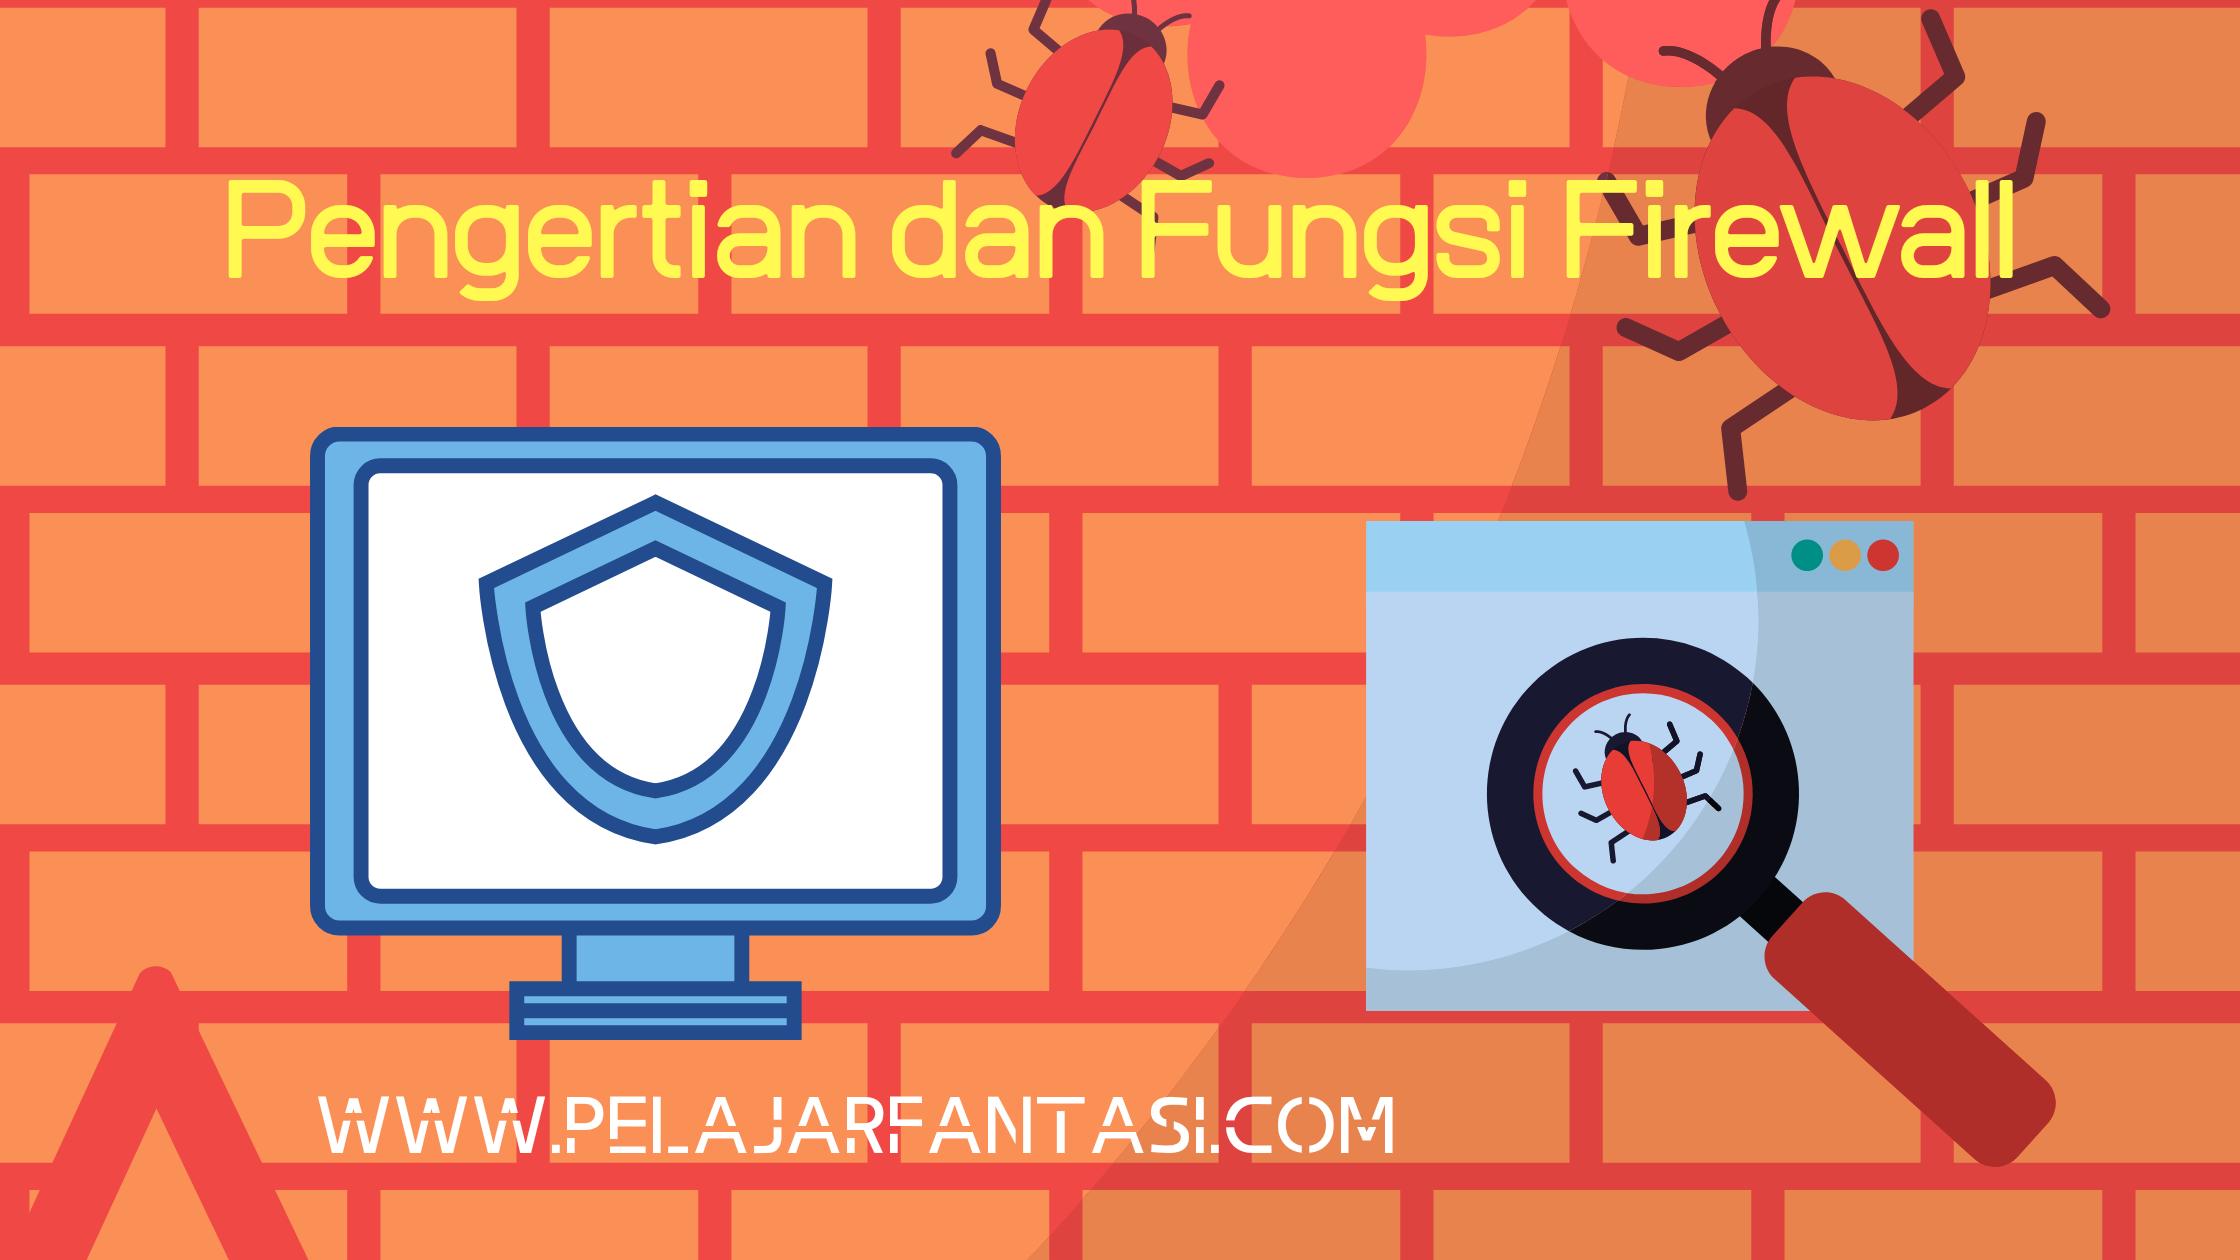 Pengertian dan Fungsi Firewall pada Jaringan Komputer